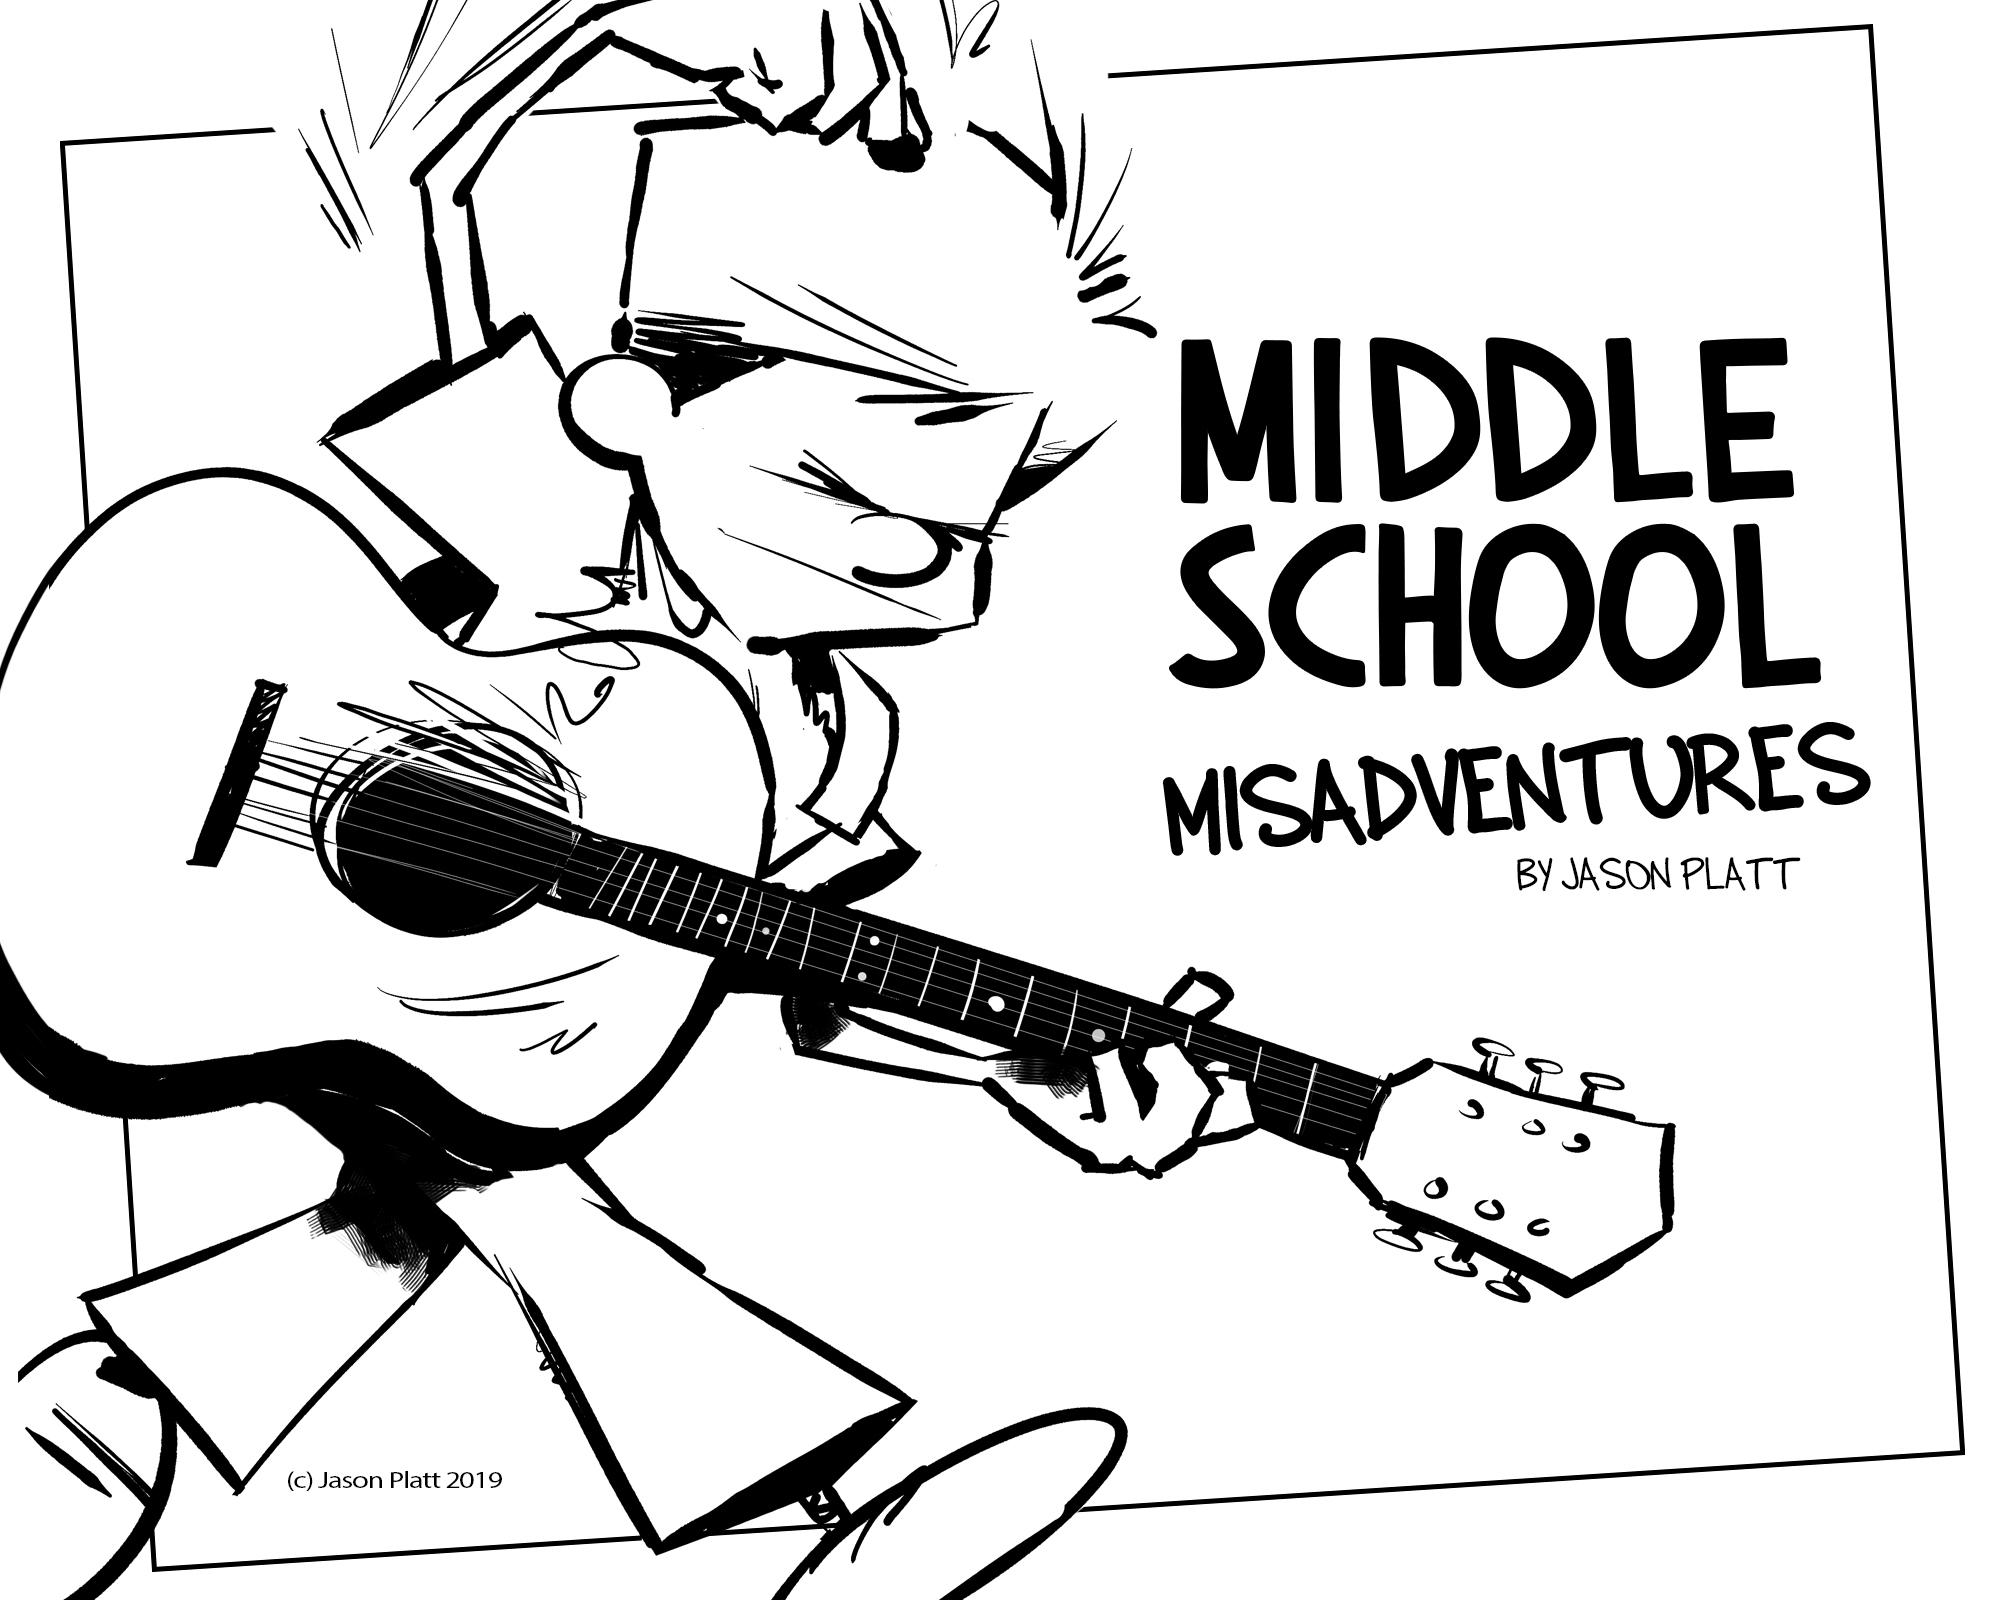 MiddleSchoolMisadventures_Coloring Page_4.jpg